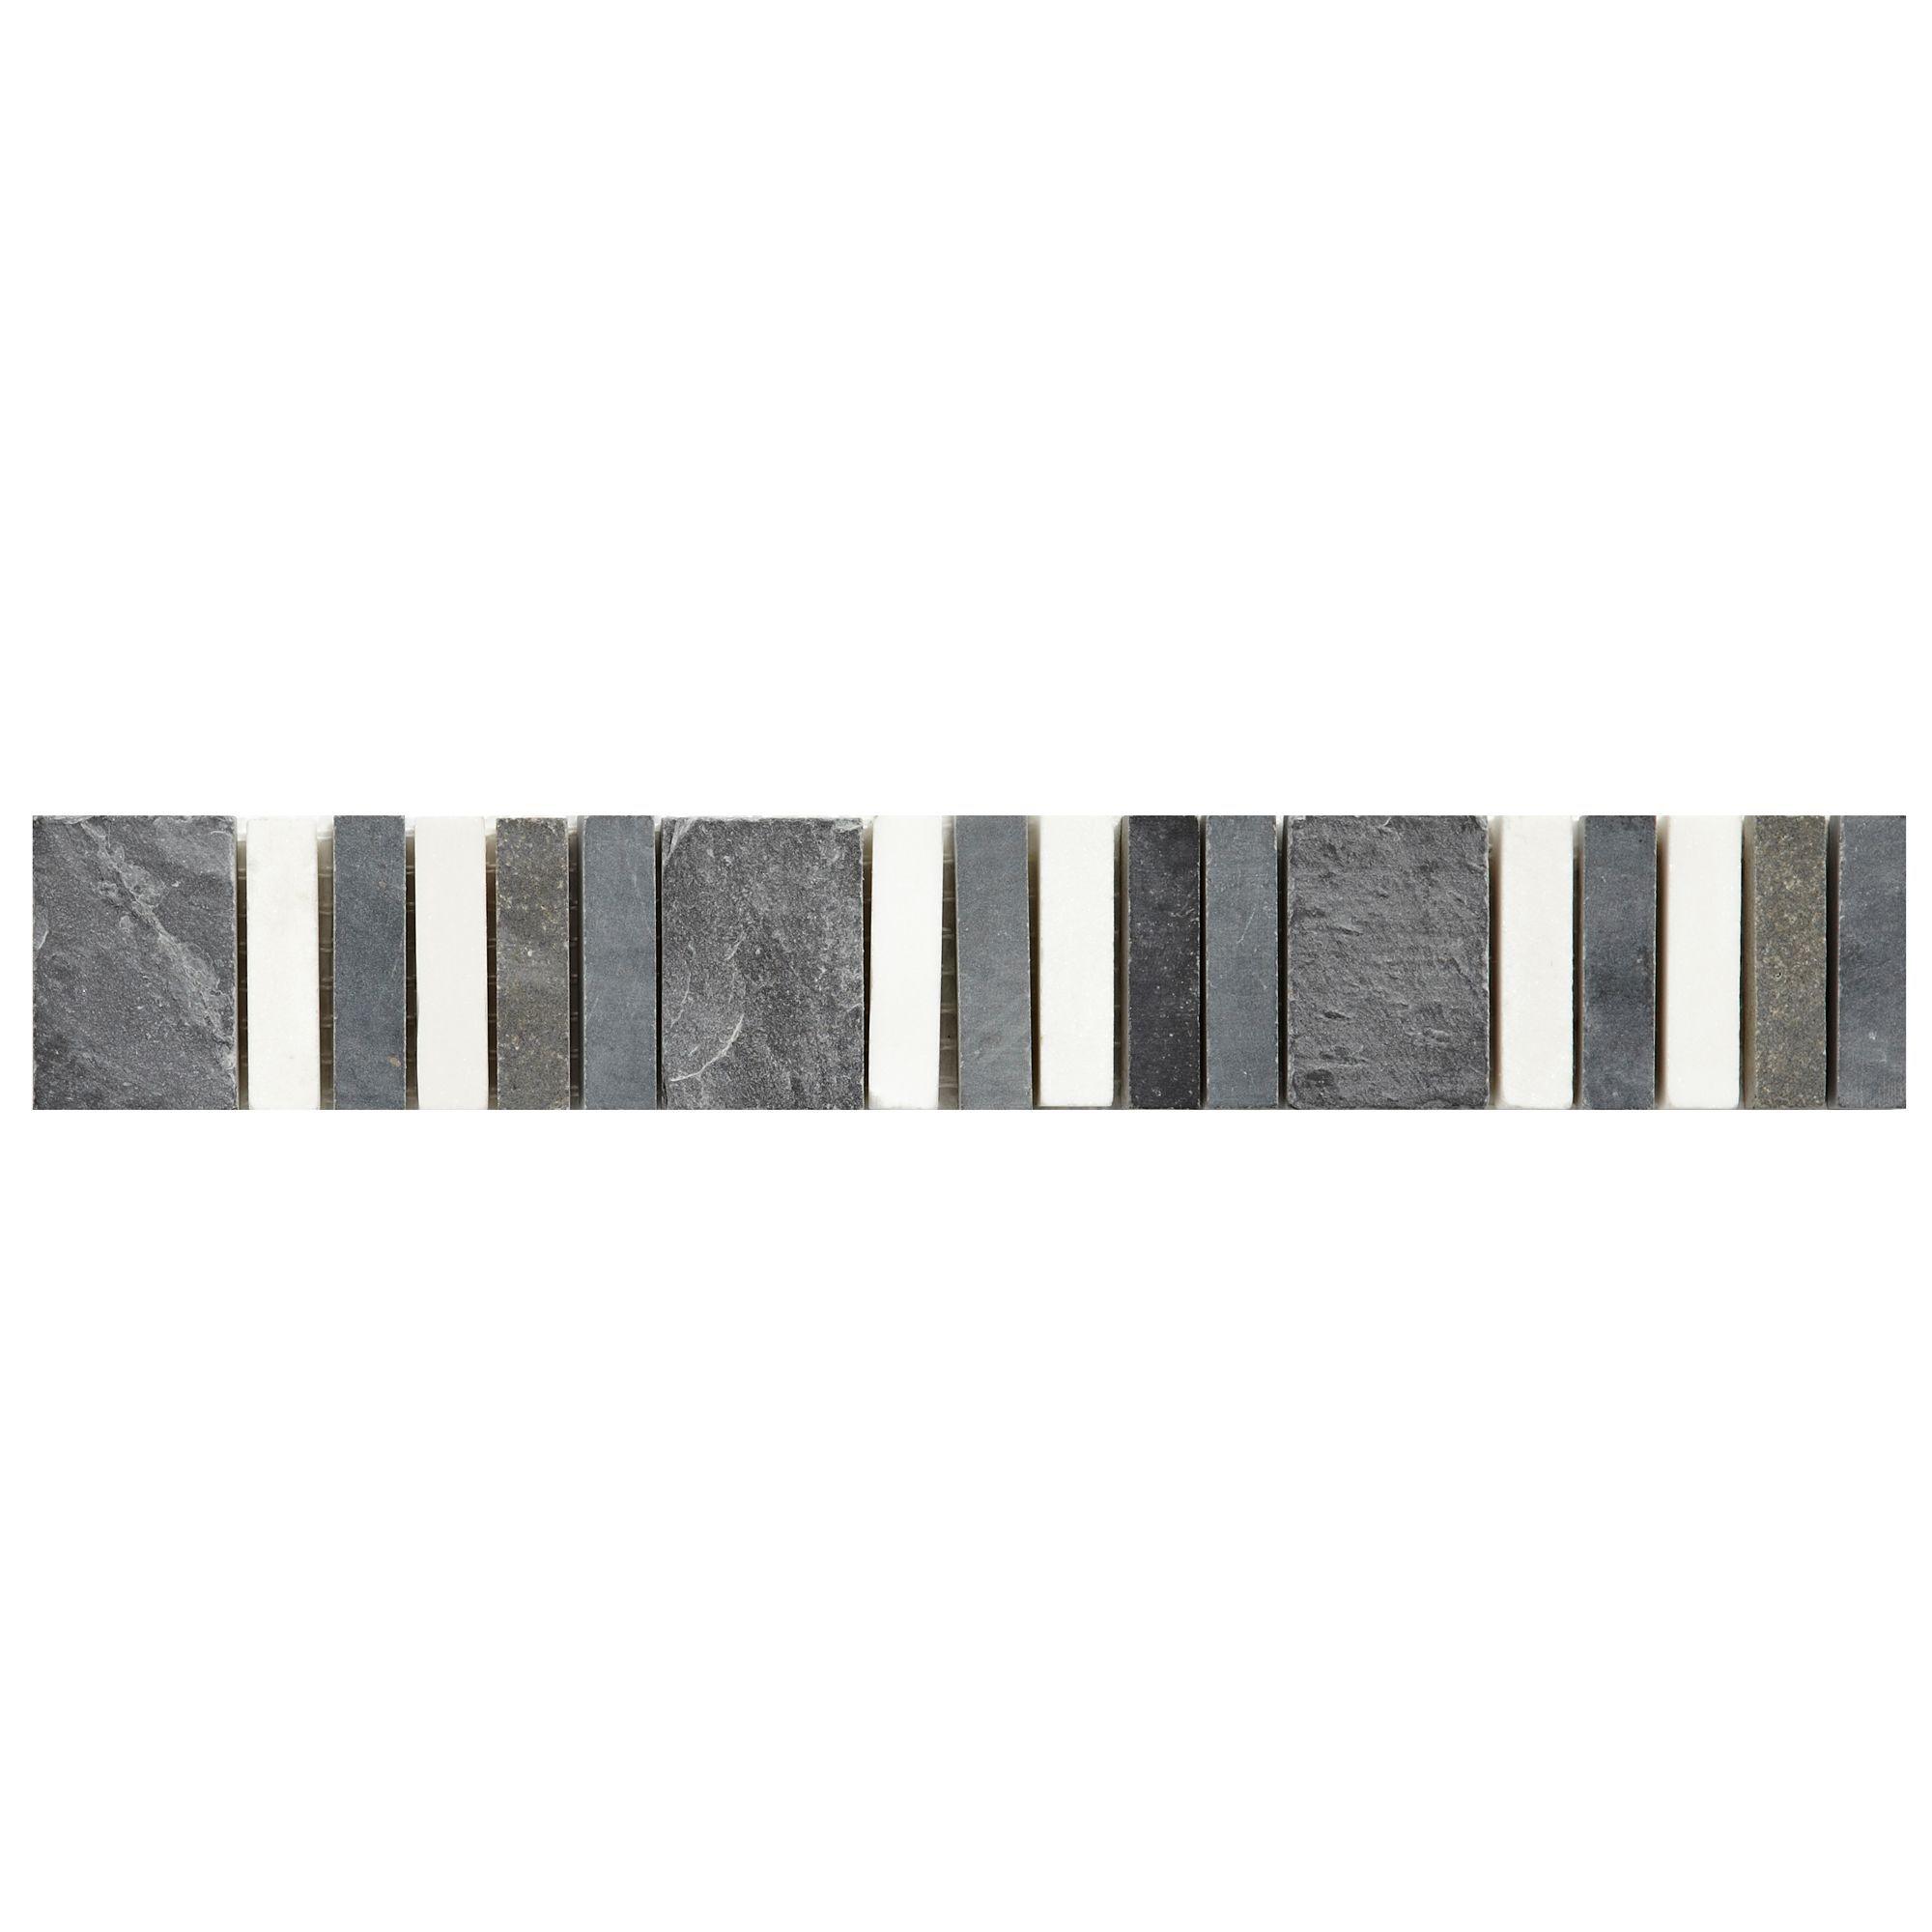 Matchstick Grey Mosaic Border Tile L250mm W40mm